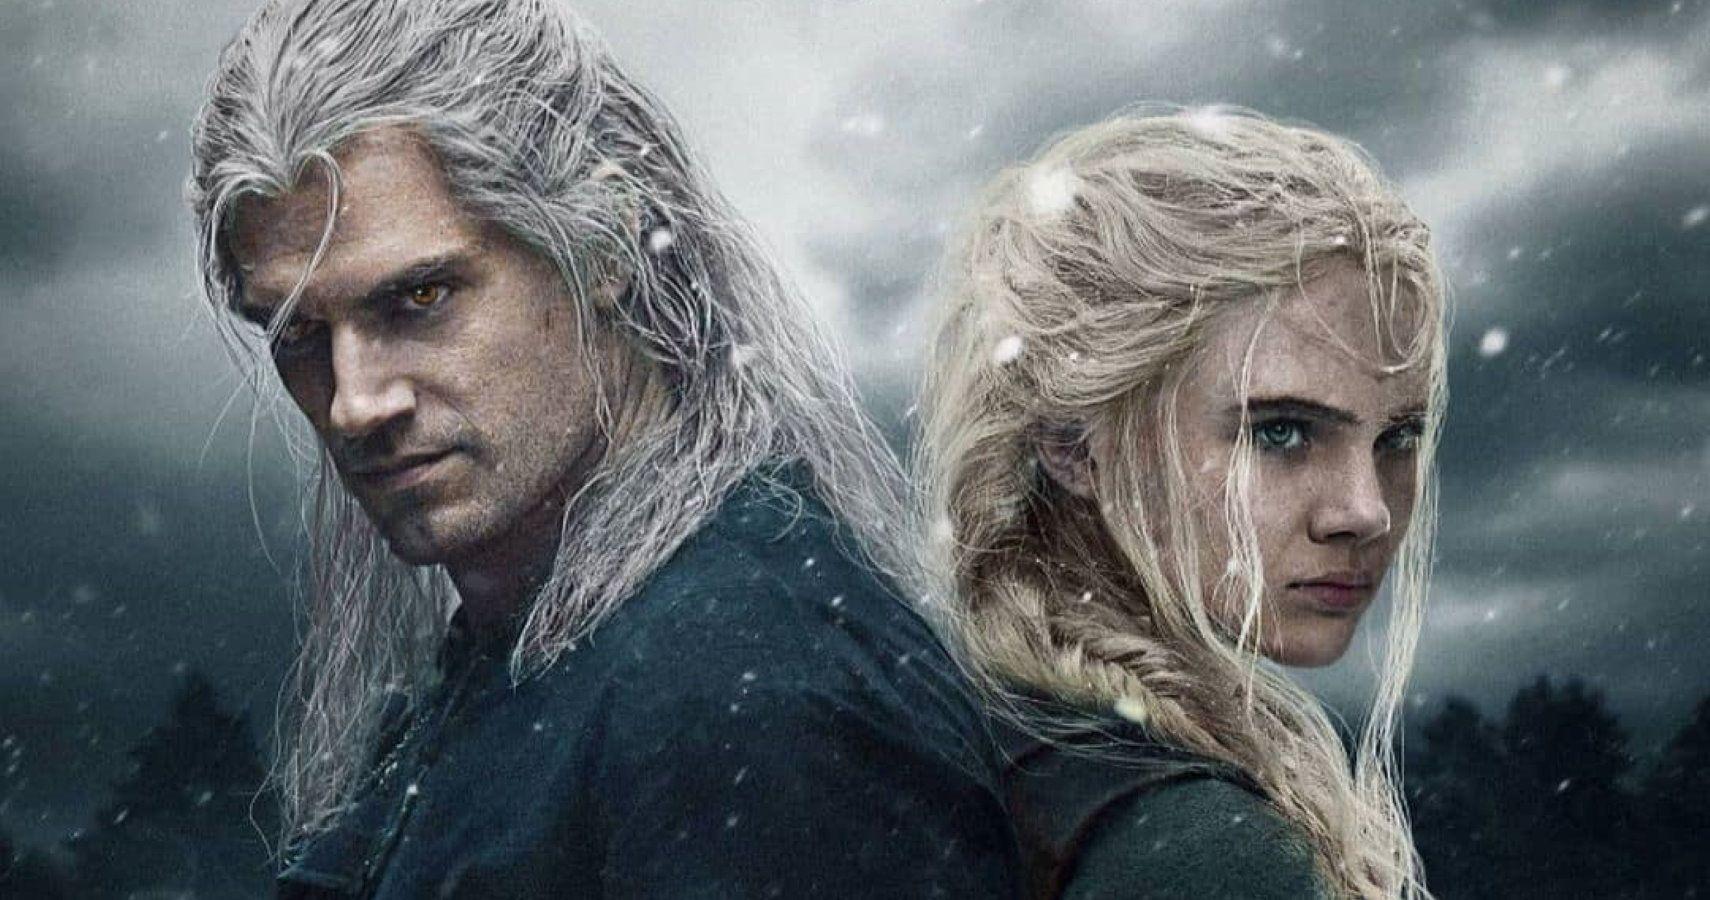 Witcher Coming Soon Netflix 2 - تیزر جدید فصل دوم سریال The Witcher توسط سرویس نتفلیکس منتشر شد